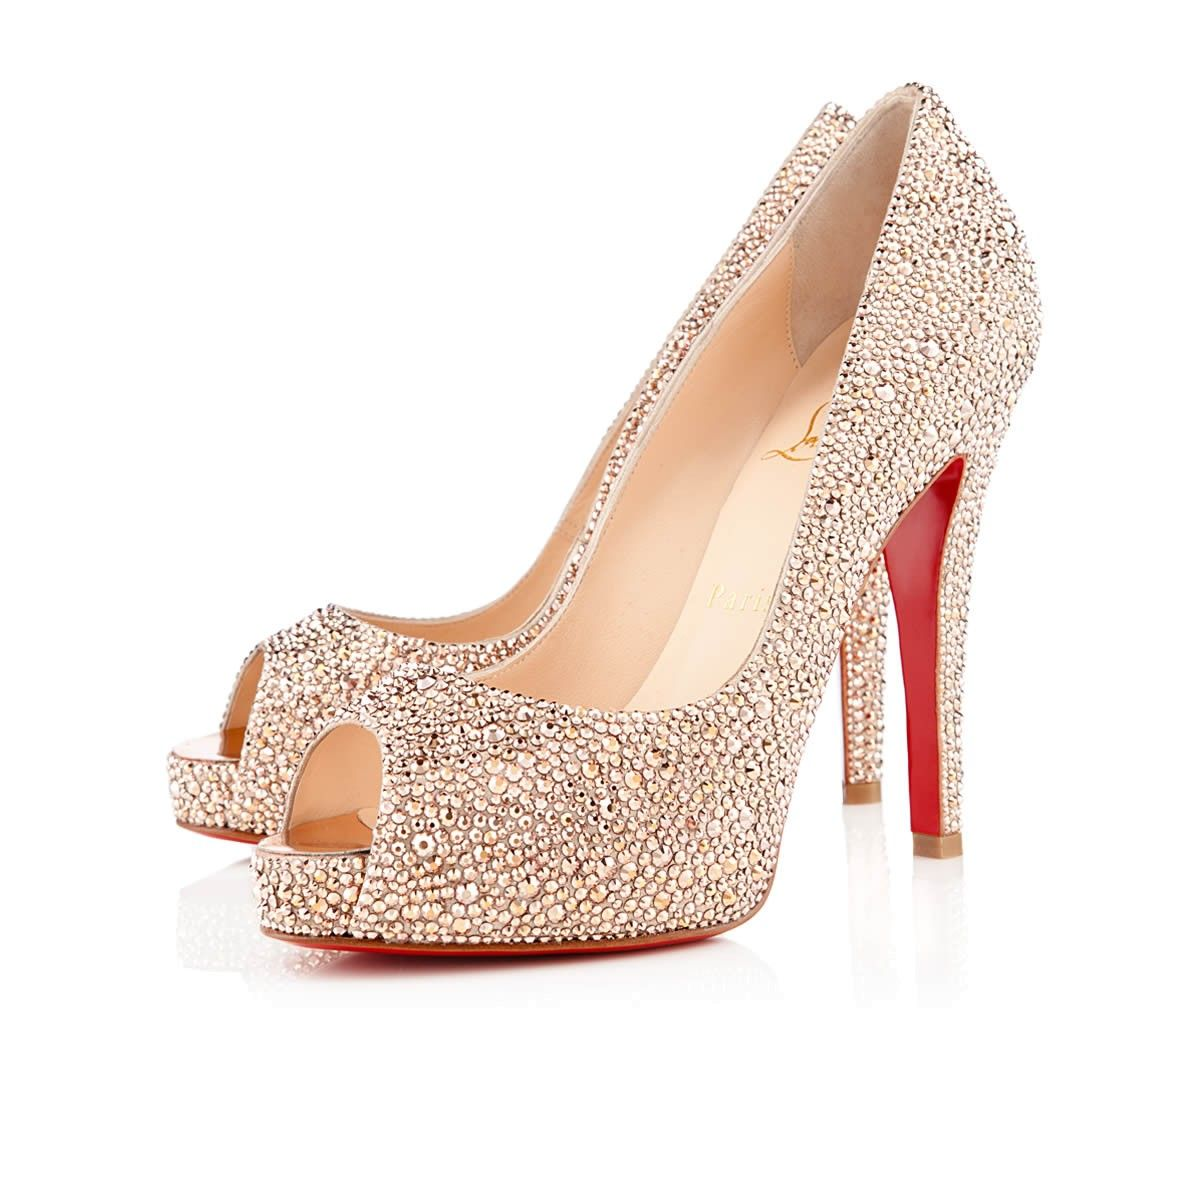 Shine Bright Like a Diamond - Very Riche Strass - Christian Louboutin #ShoeLove